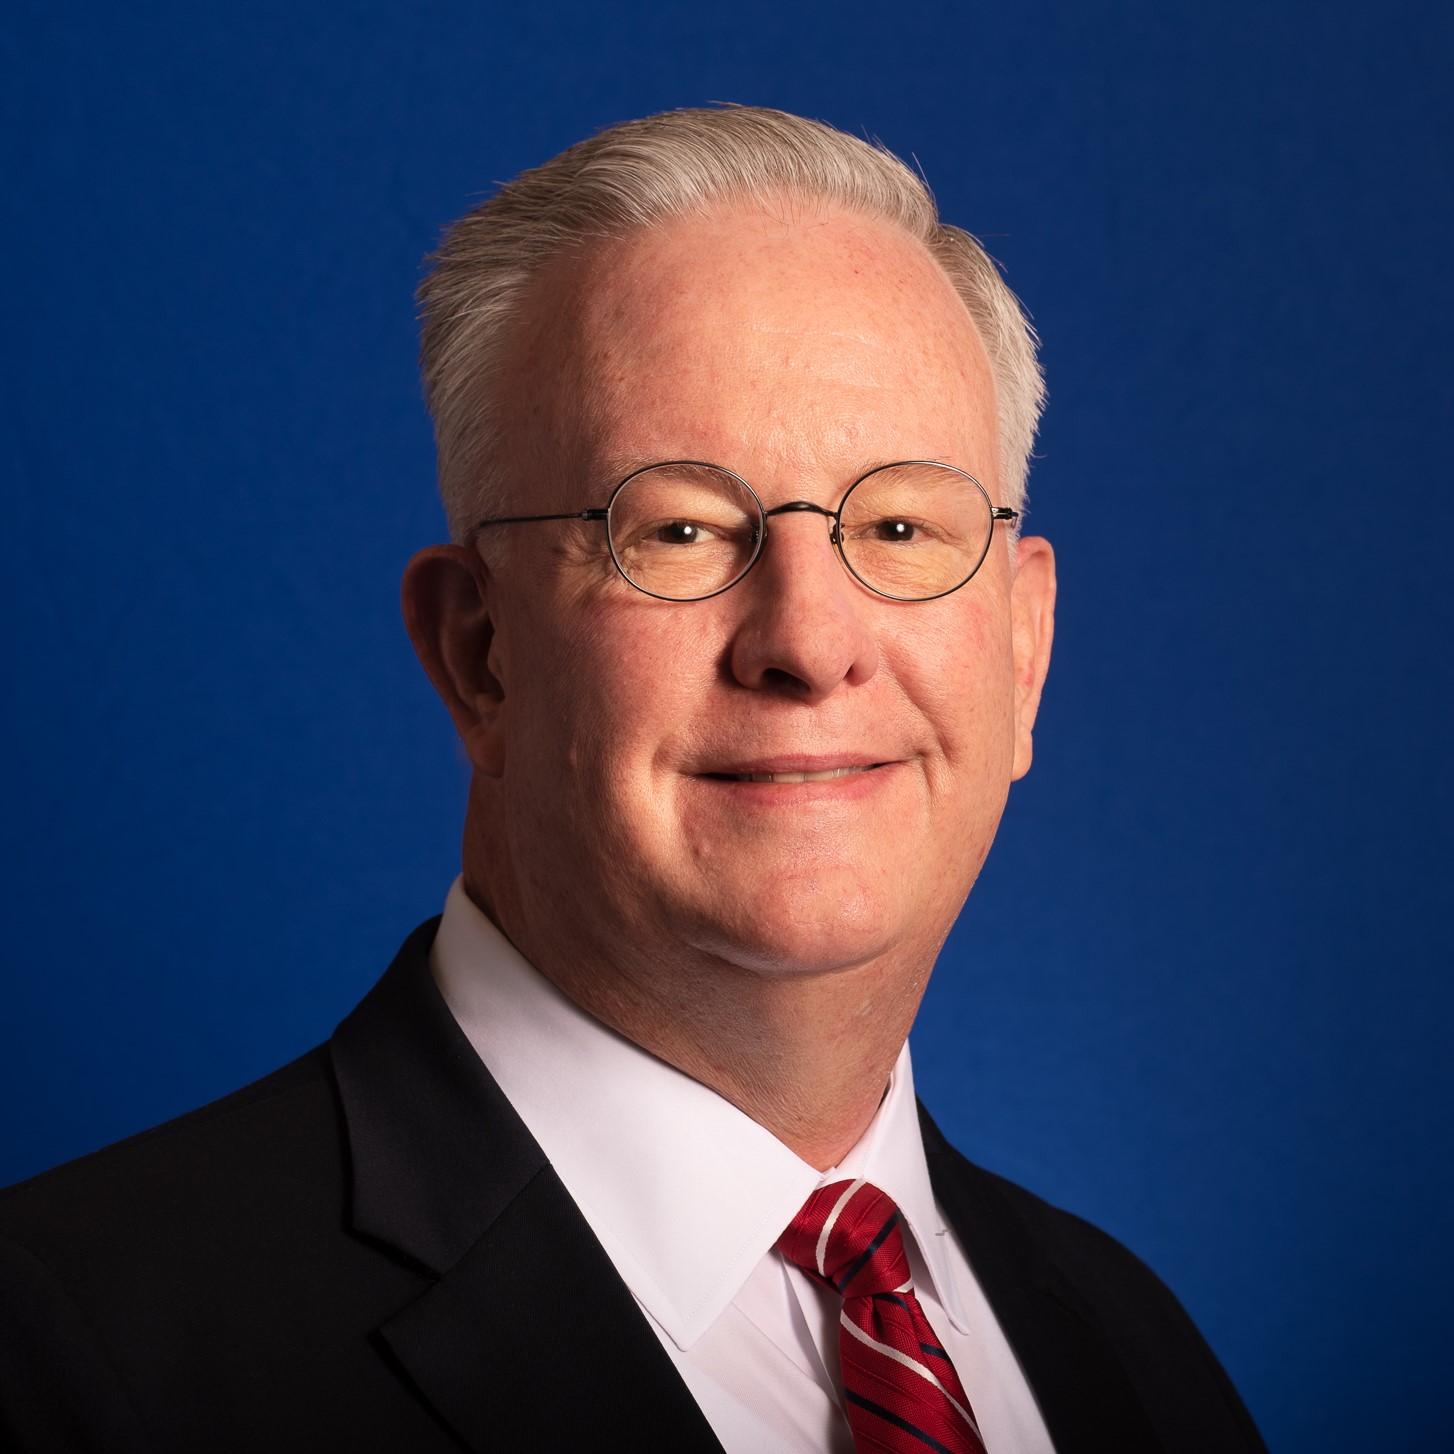 Rob Hugos, JD, CPA, LLM (Tax)